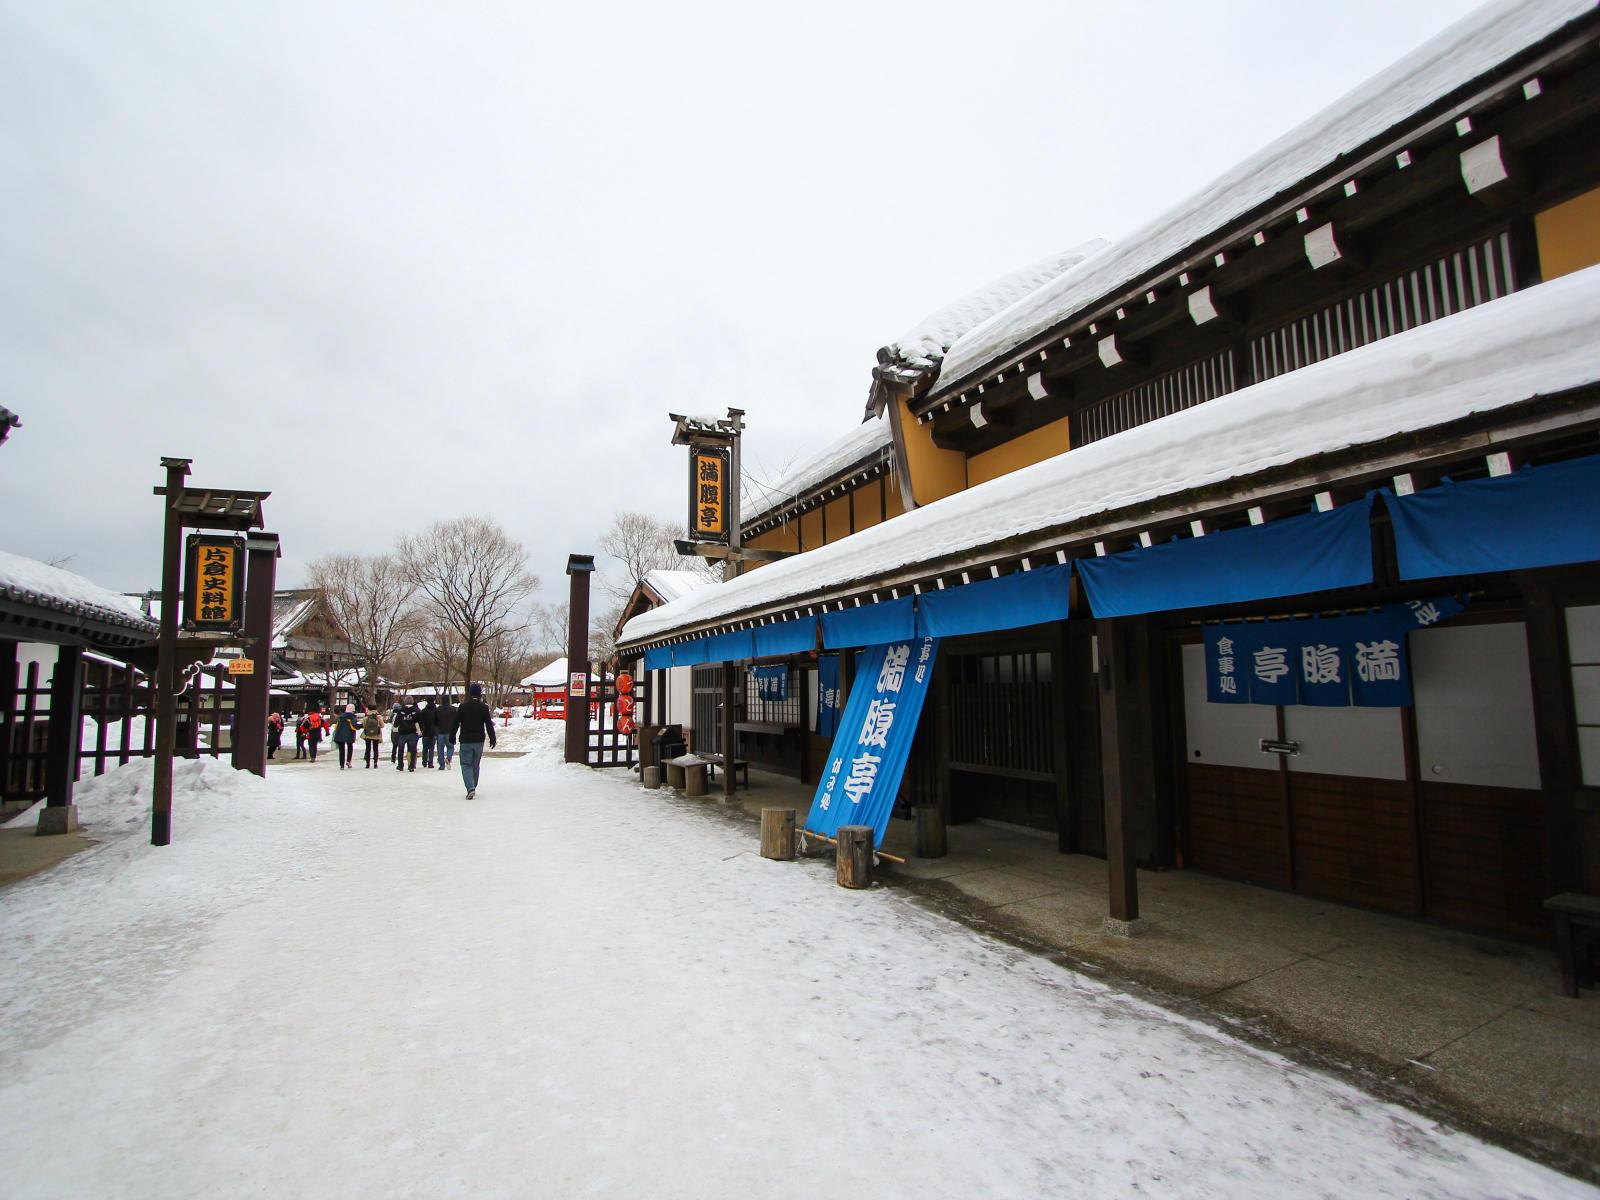 Noboribetsu Date Jidaimura Travel Tips Odigo